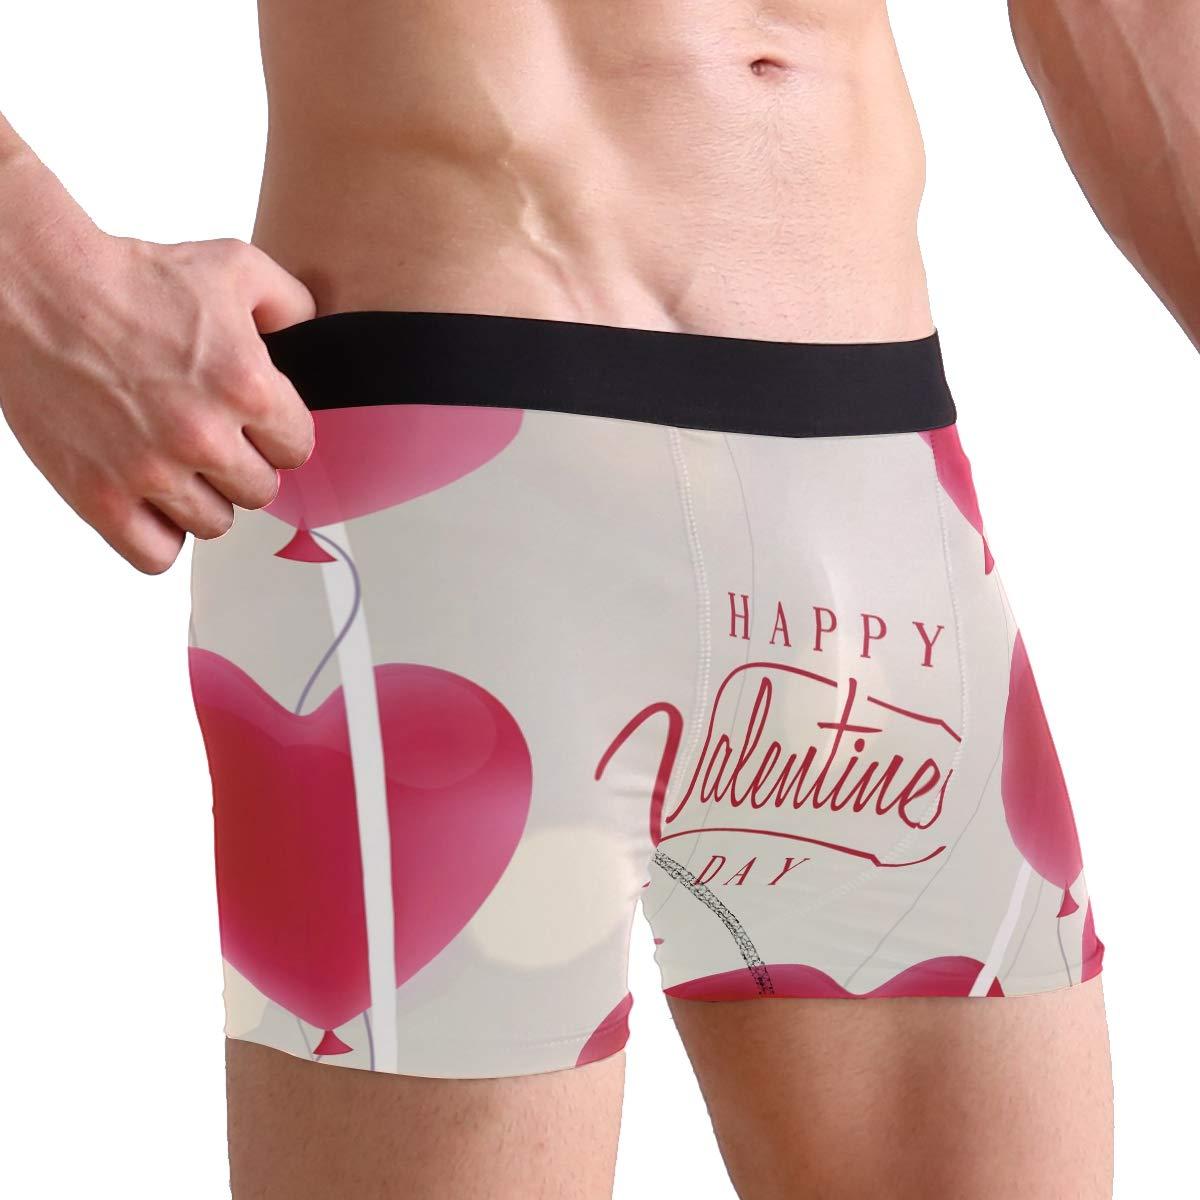 SUABO Men Boxer Briefs Polyester Underwear Men 2 Pack Boxer Briefs for Valentines Gift with Valentines Day Balloon Pattern